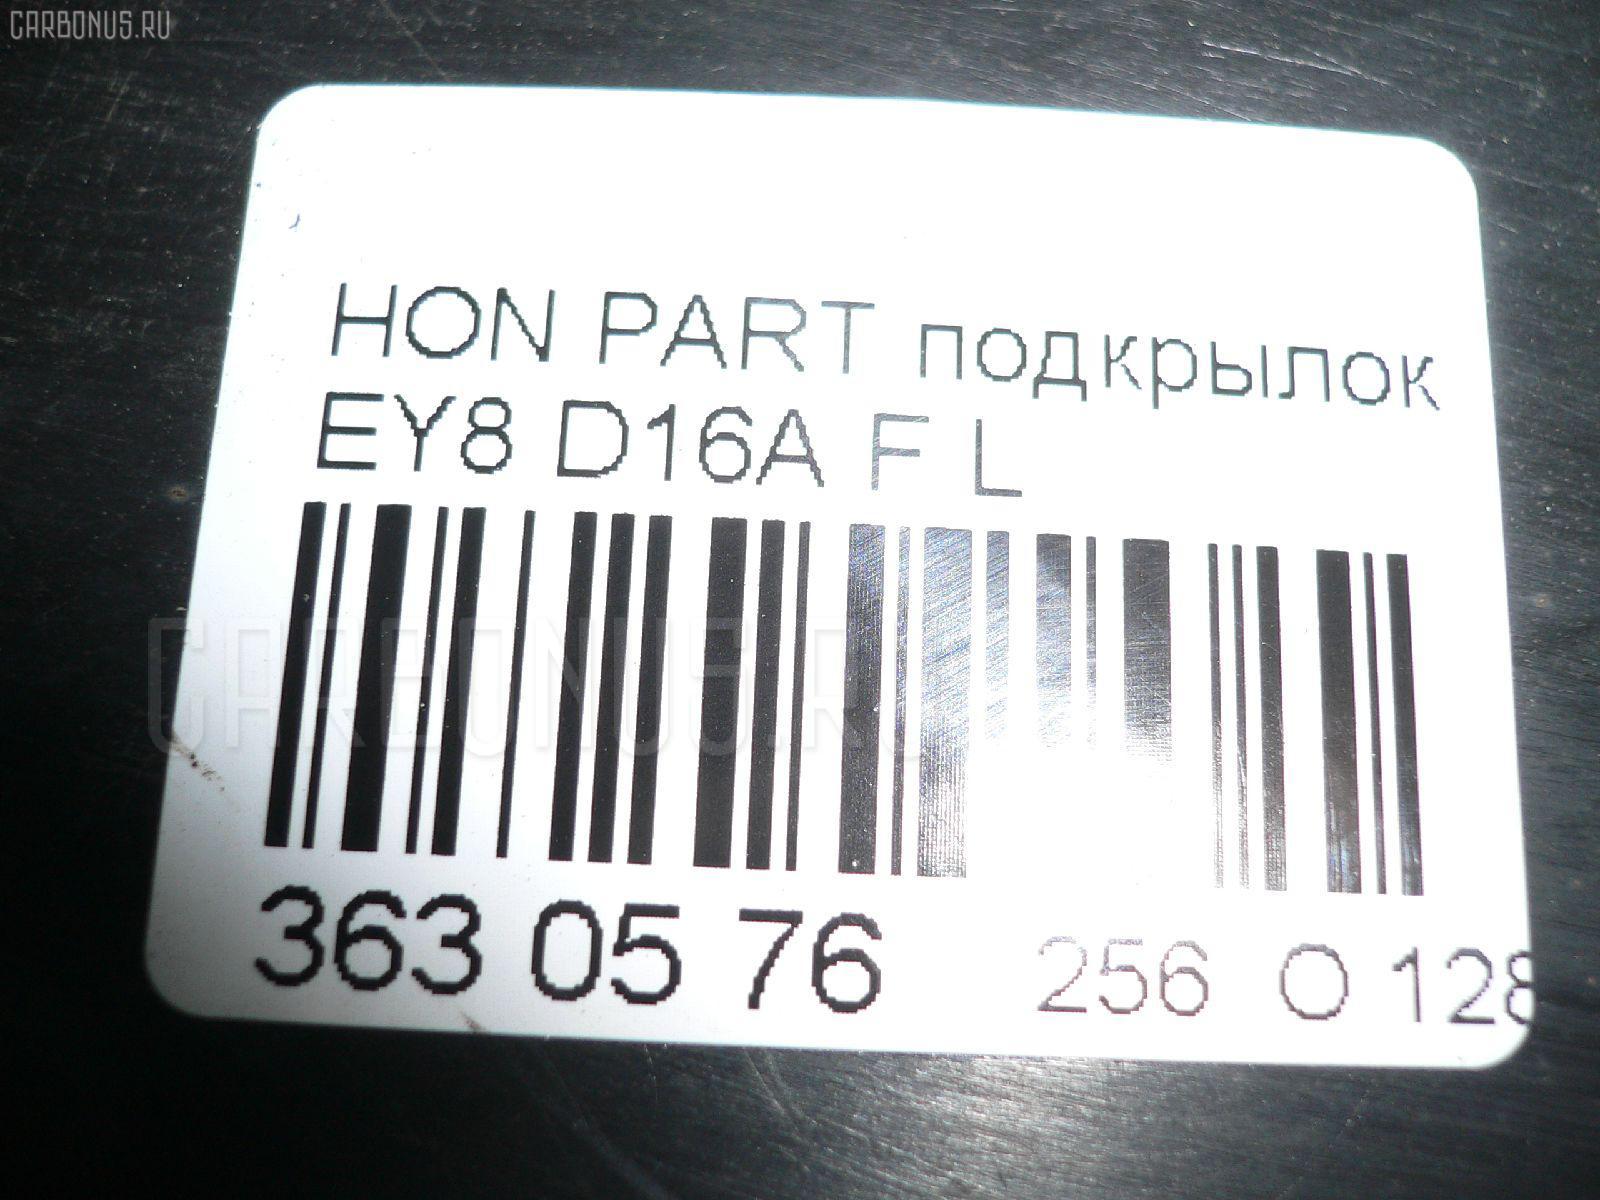 Подкрылок HONDA PARTNER EY8 D16A Фото 2